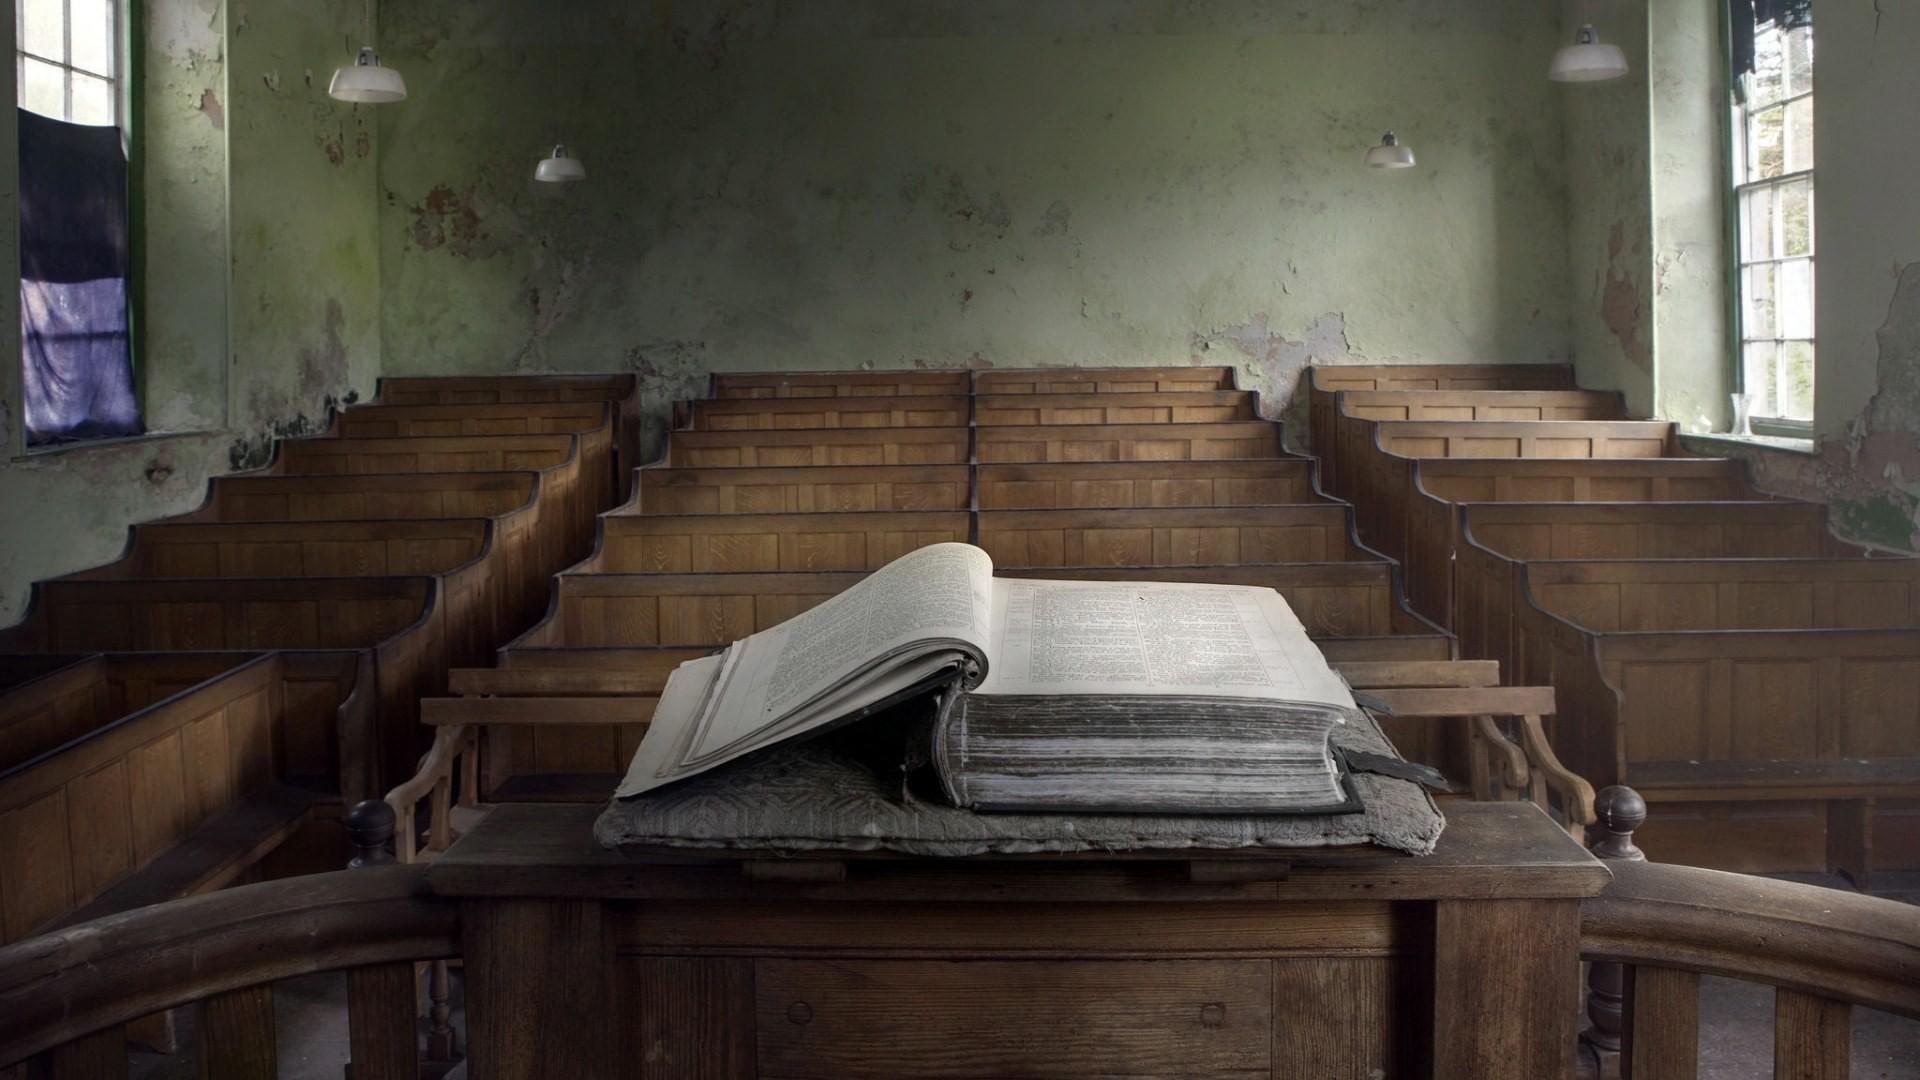 Classroom Wallpaper Design ~ Hintergrundbilder fenster gebäude zimmer innere